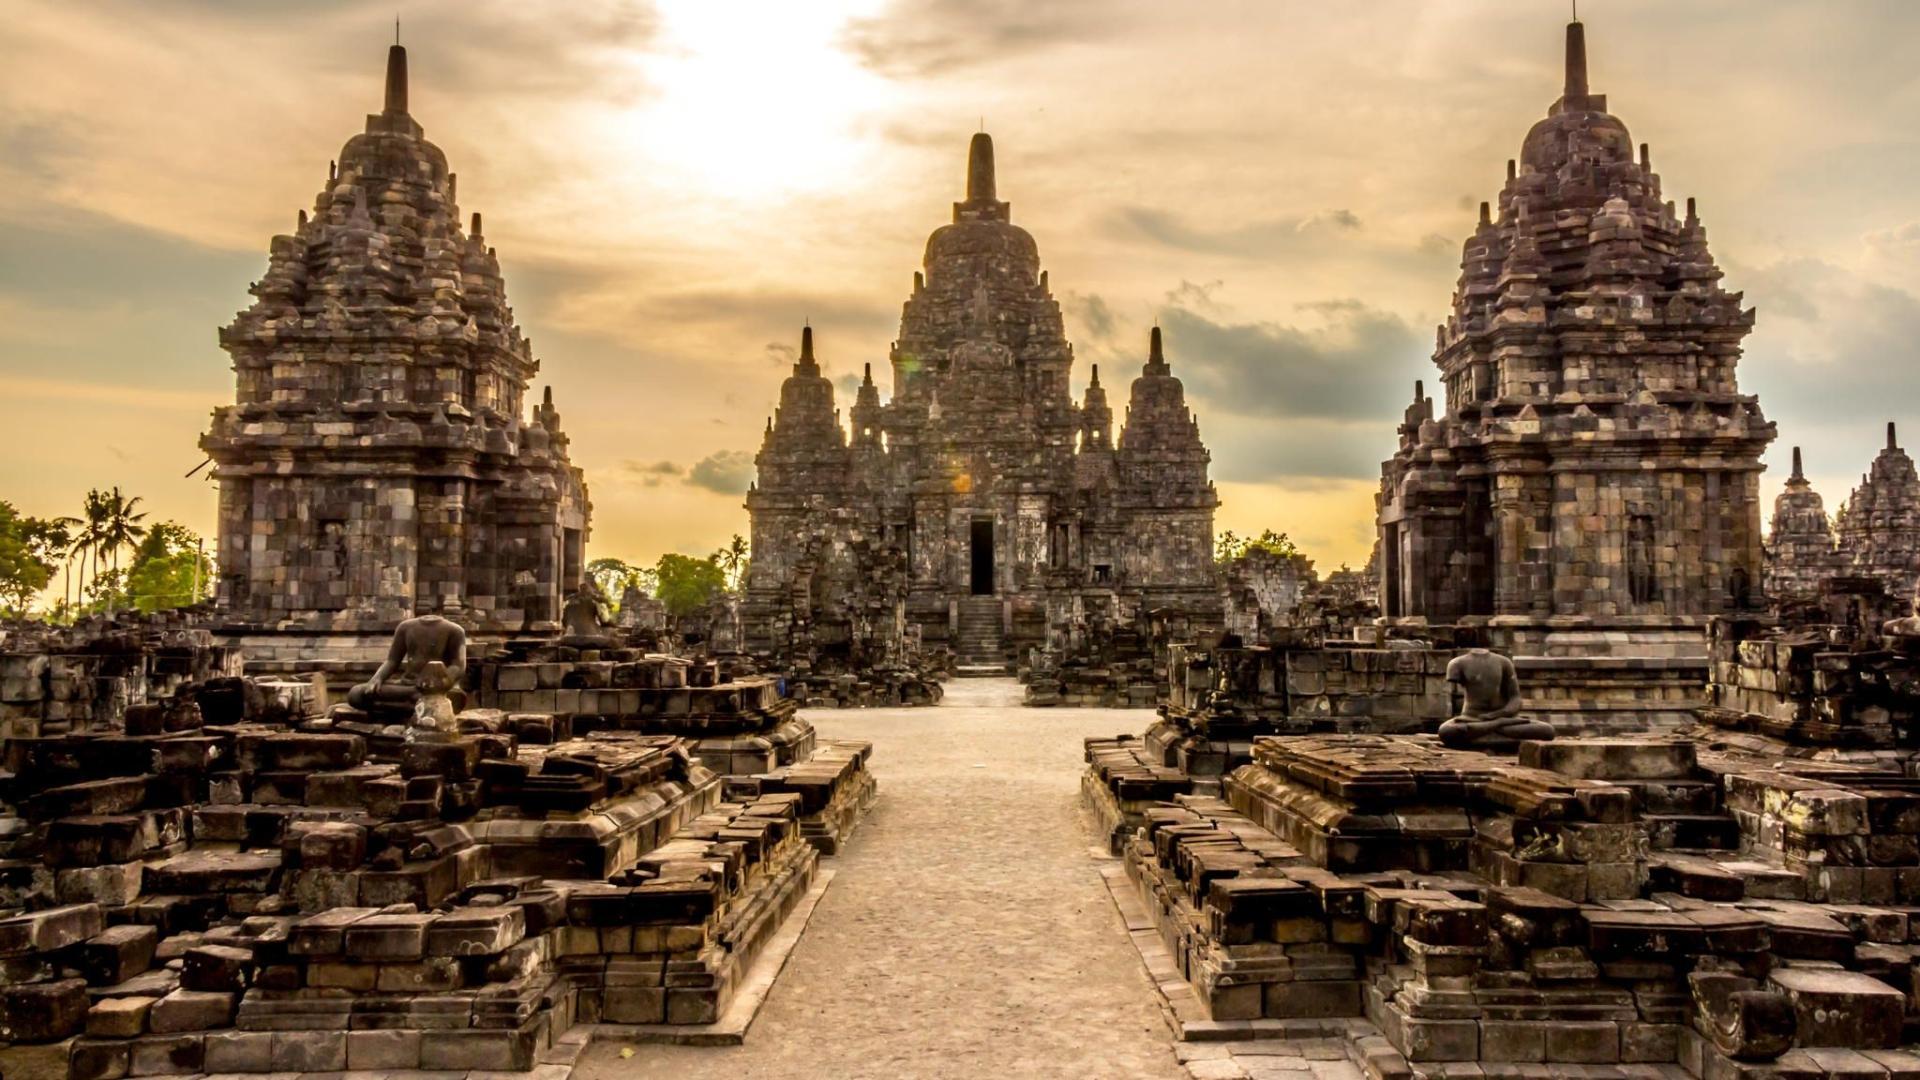 Prambanan Temple wallpapers HD quality